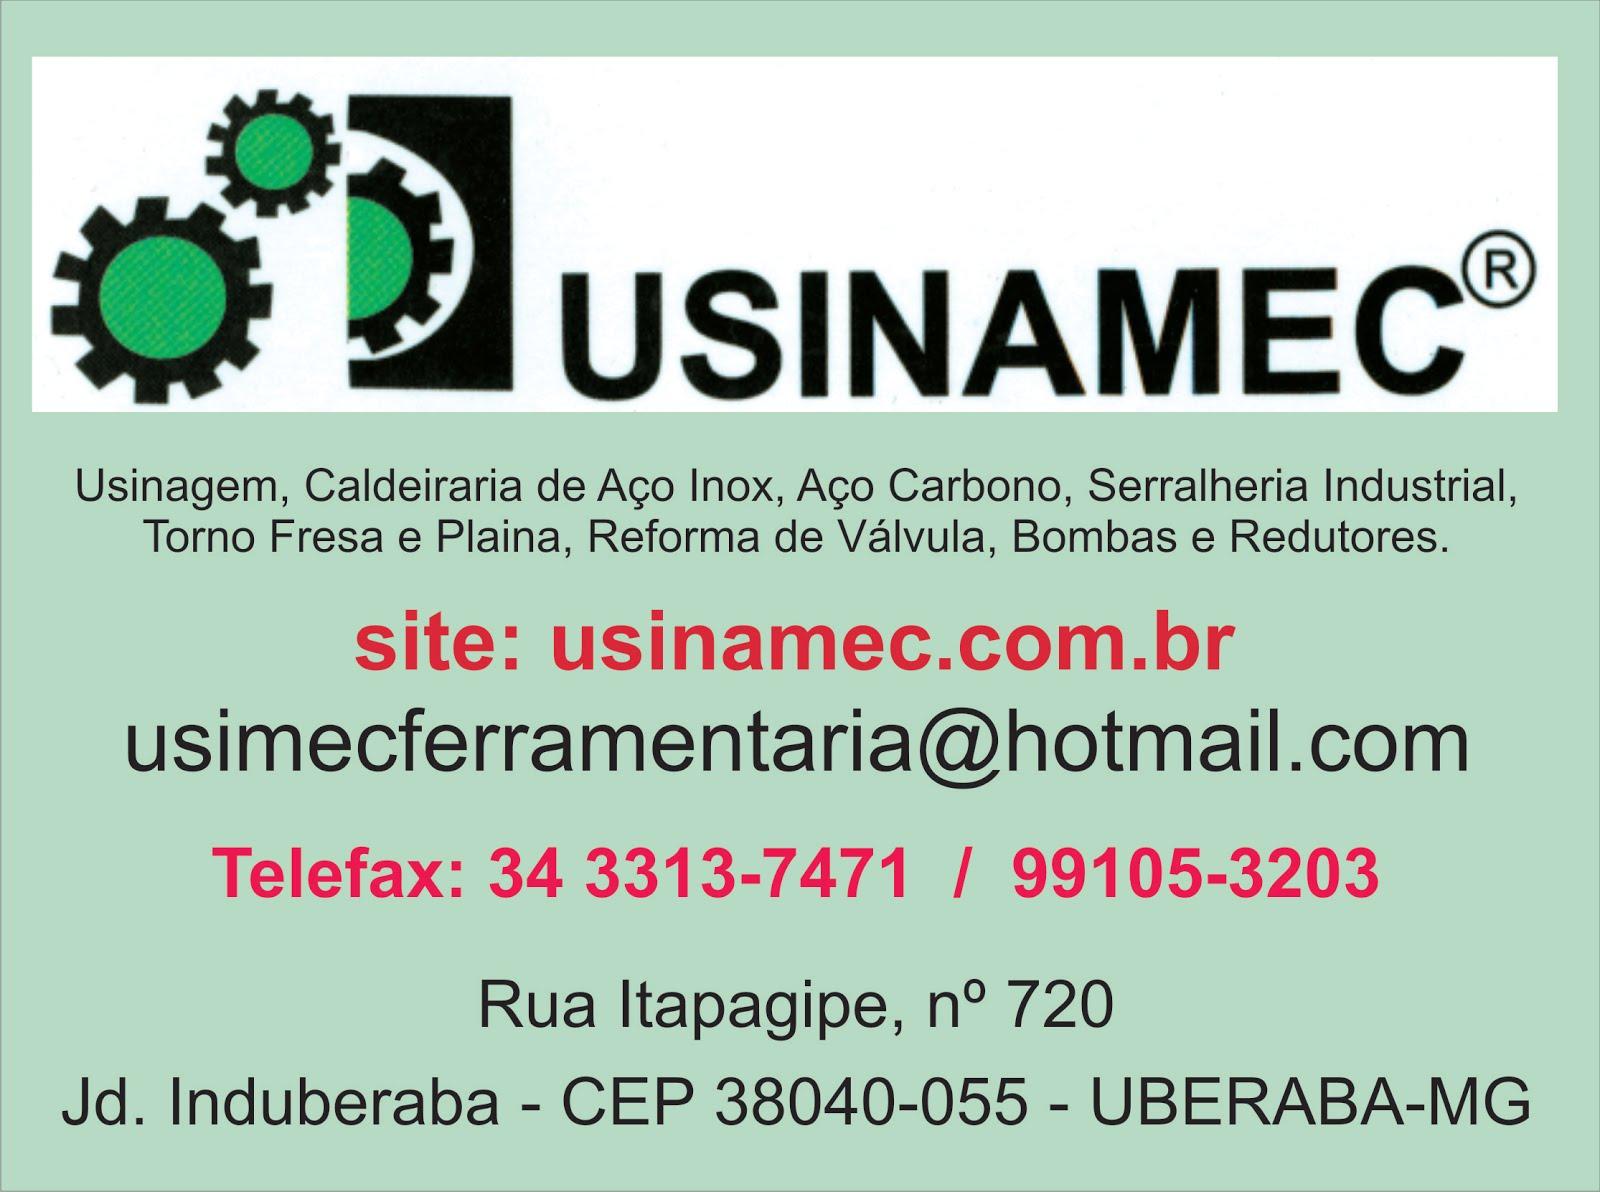 USINAMEC